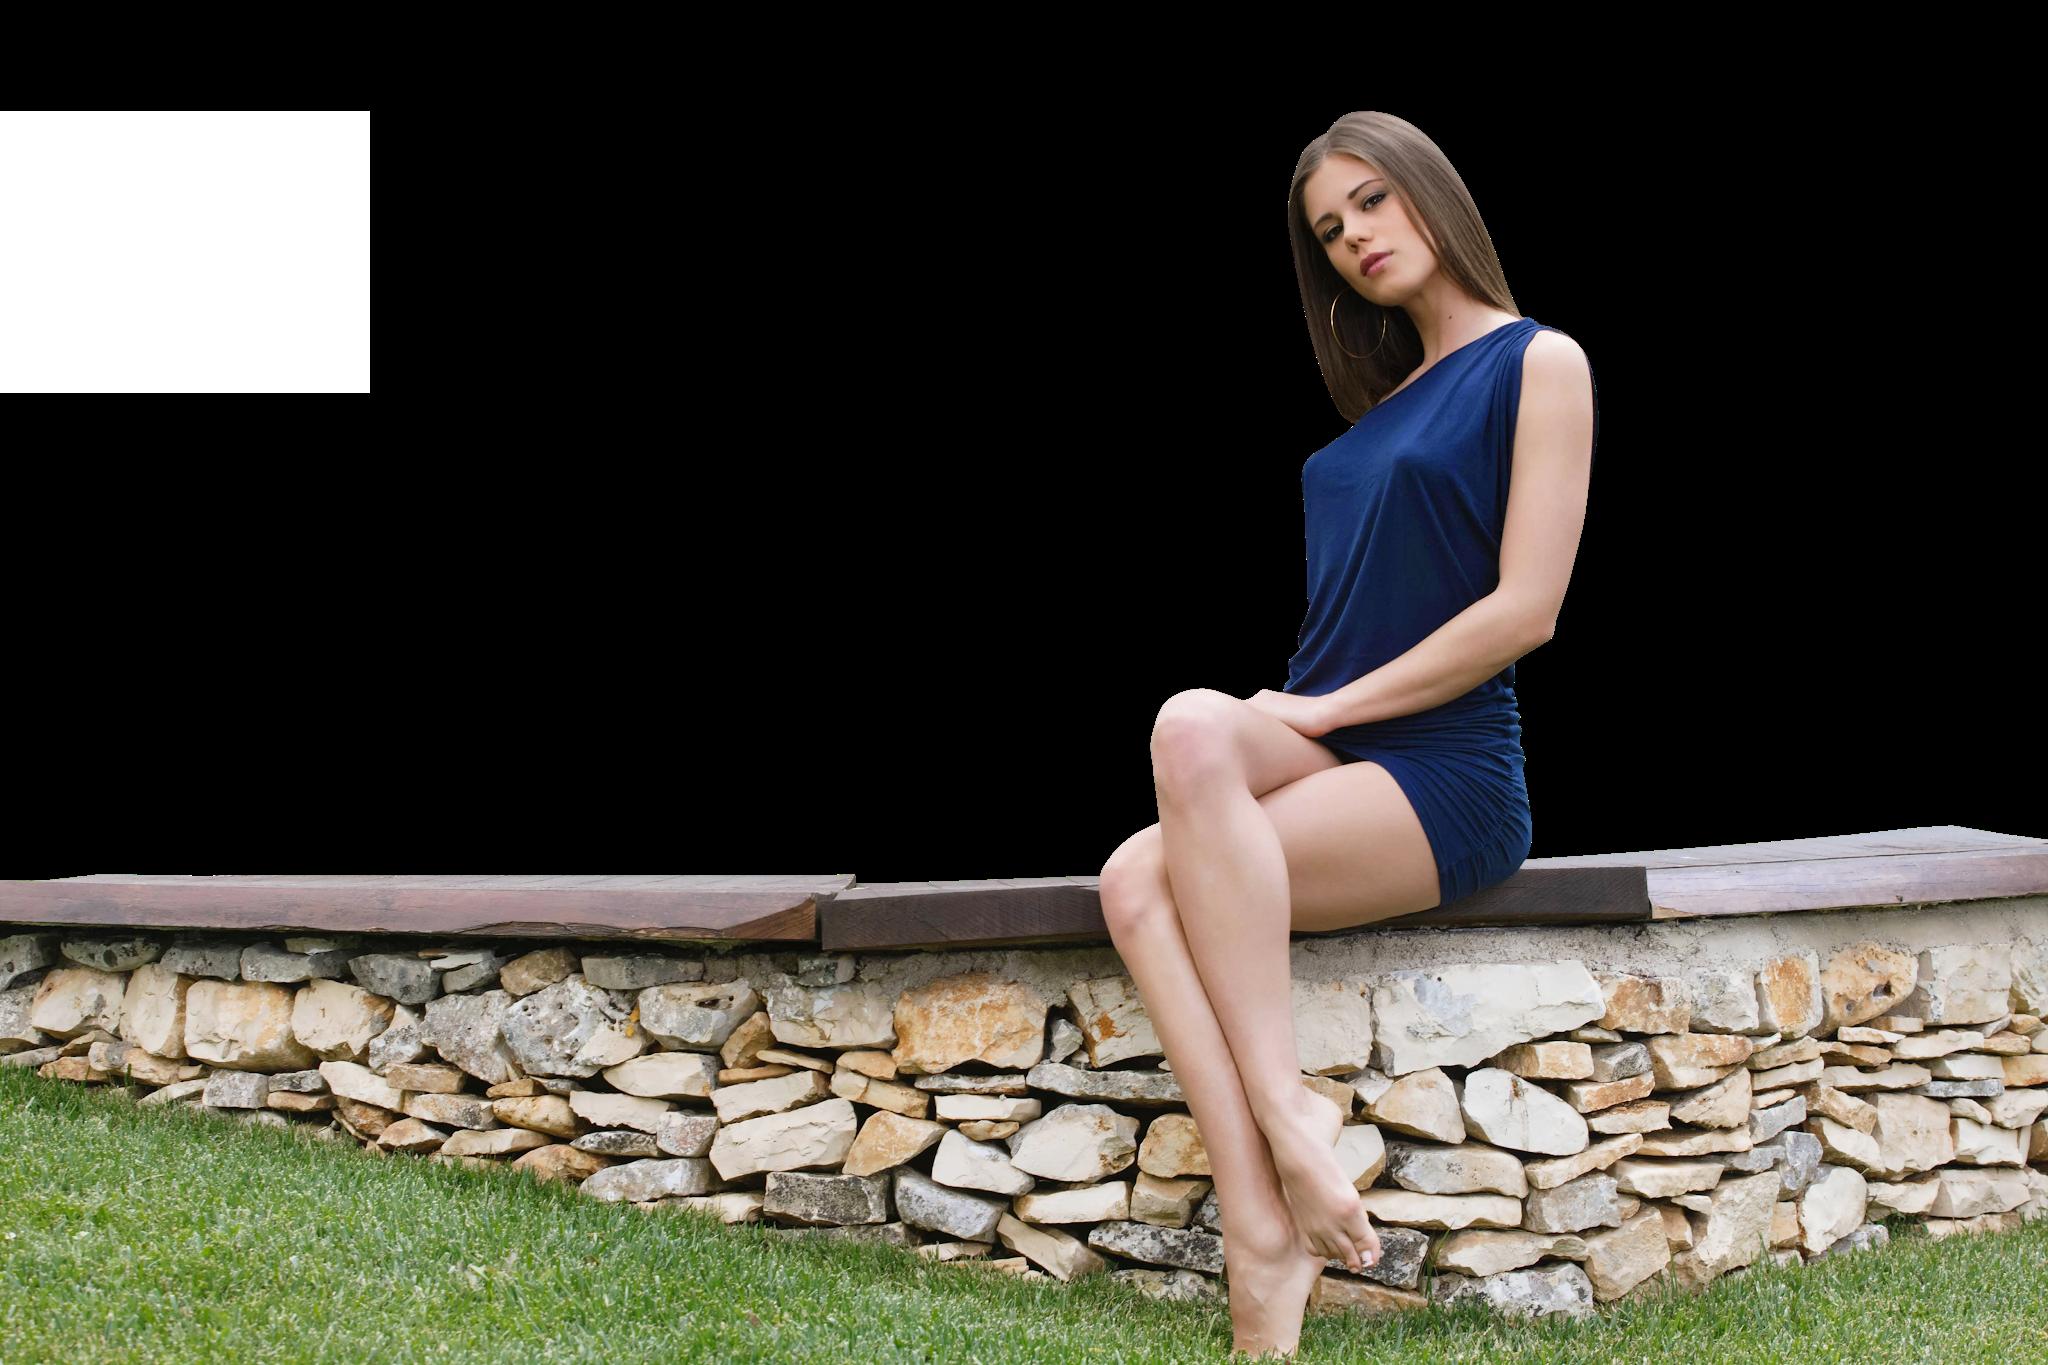 Sitting Little Caprice in Blue Dress